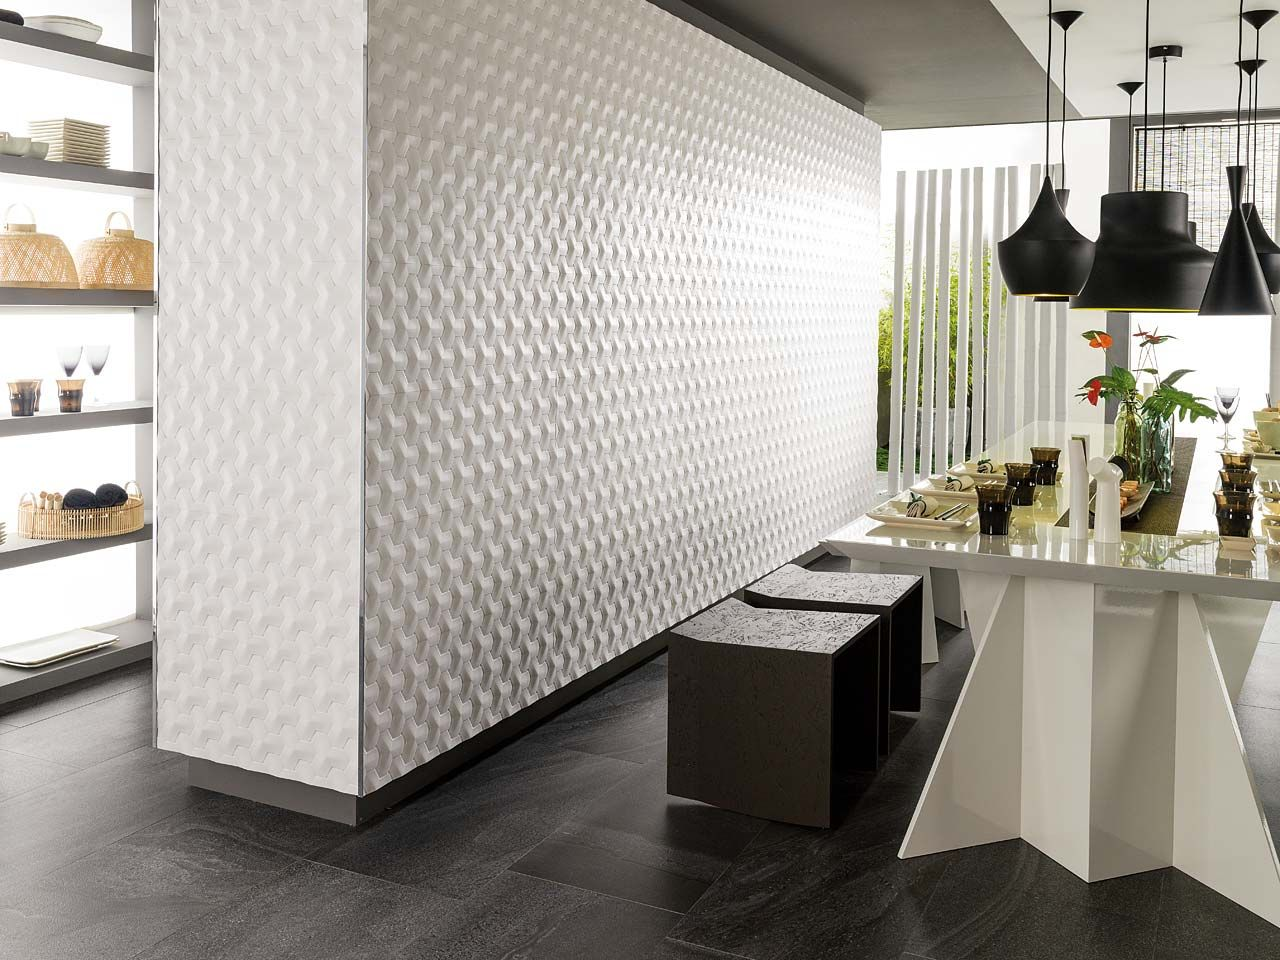 Porcelanosa tile: Oxo Hannover Blanco 31,6 x 90 cm Inspiration ...